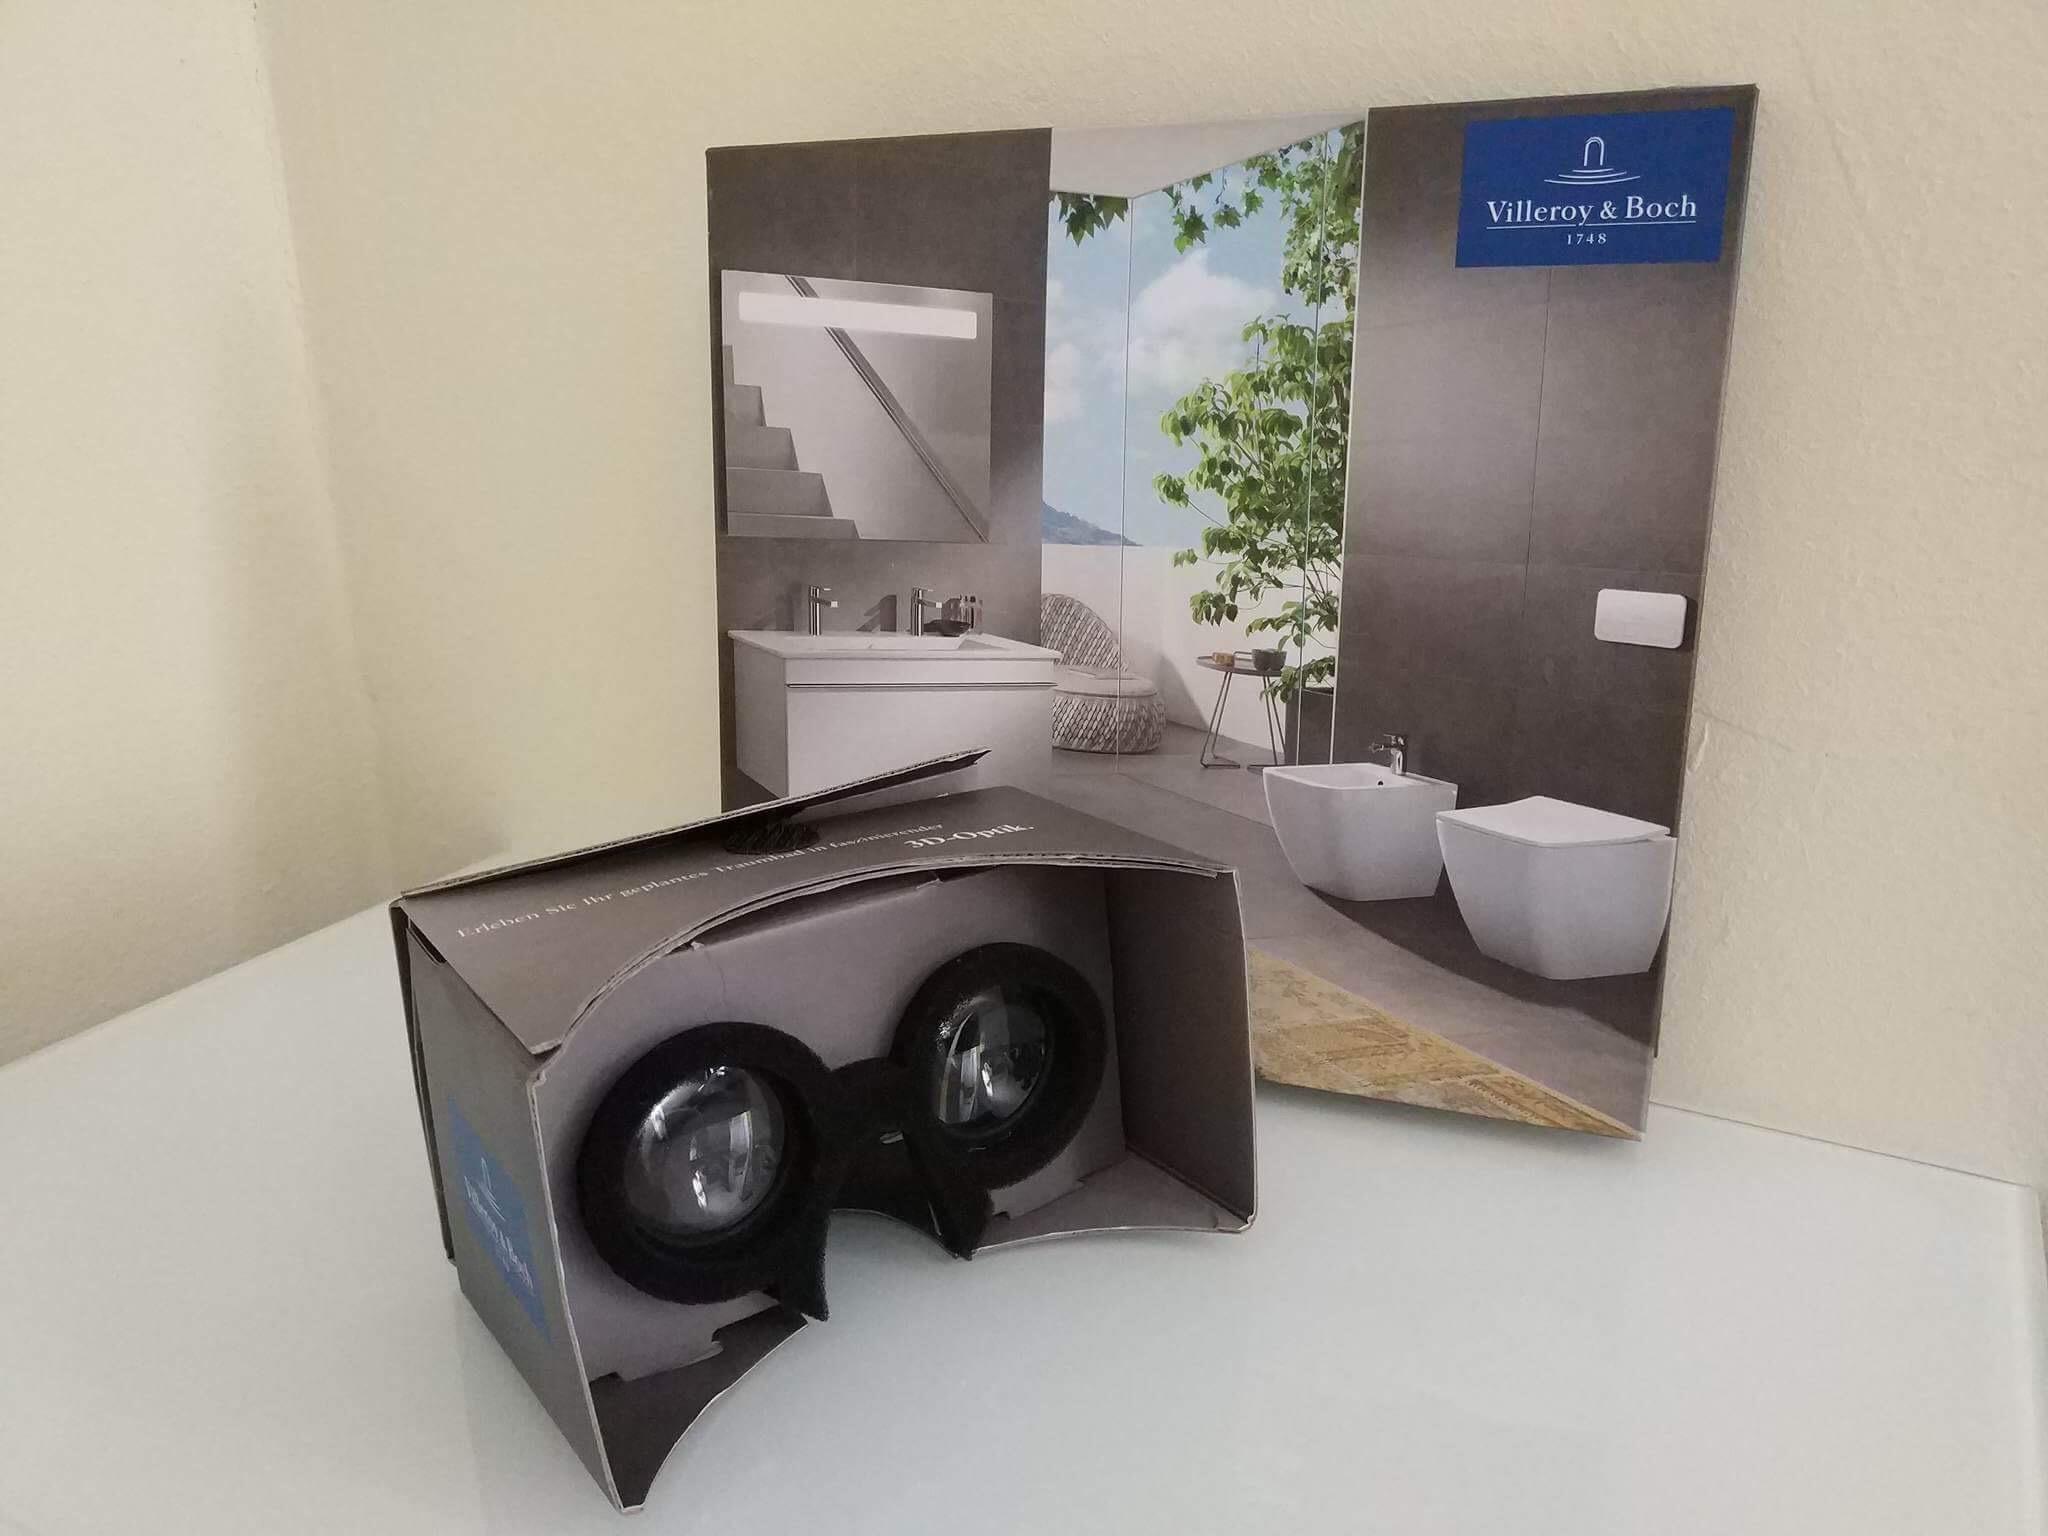 [villeroy-boch.de] VR Cardboard kostenlos nach kurzer Badeplanung!